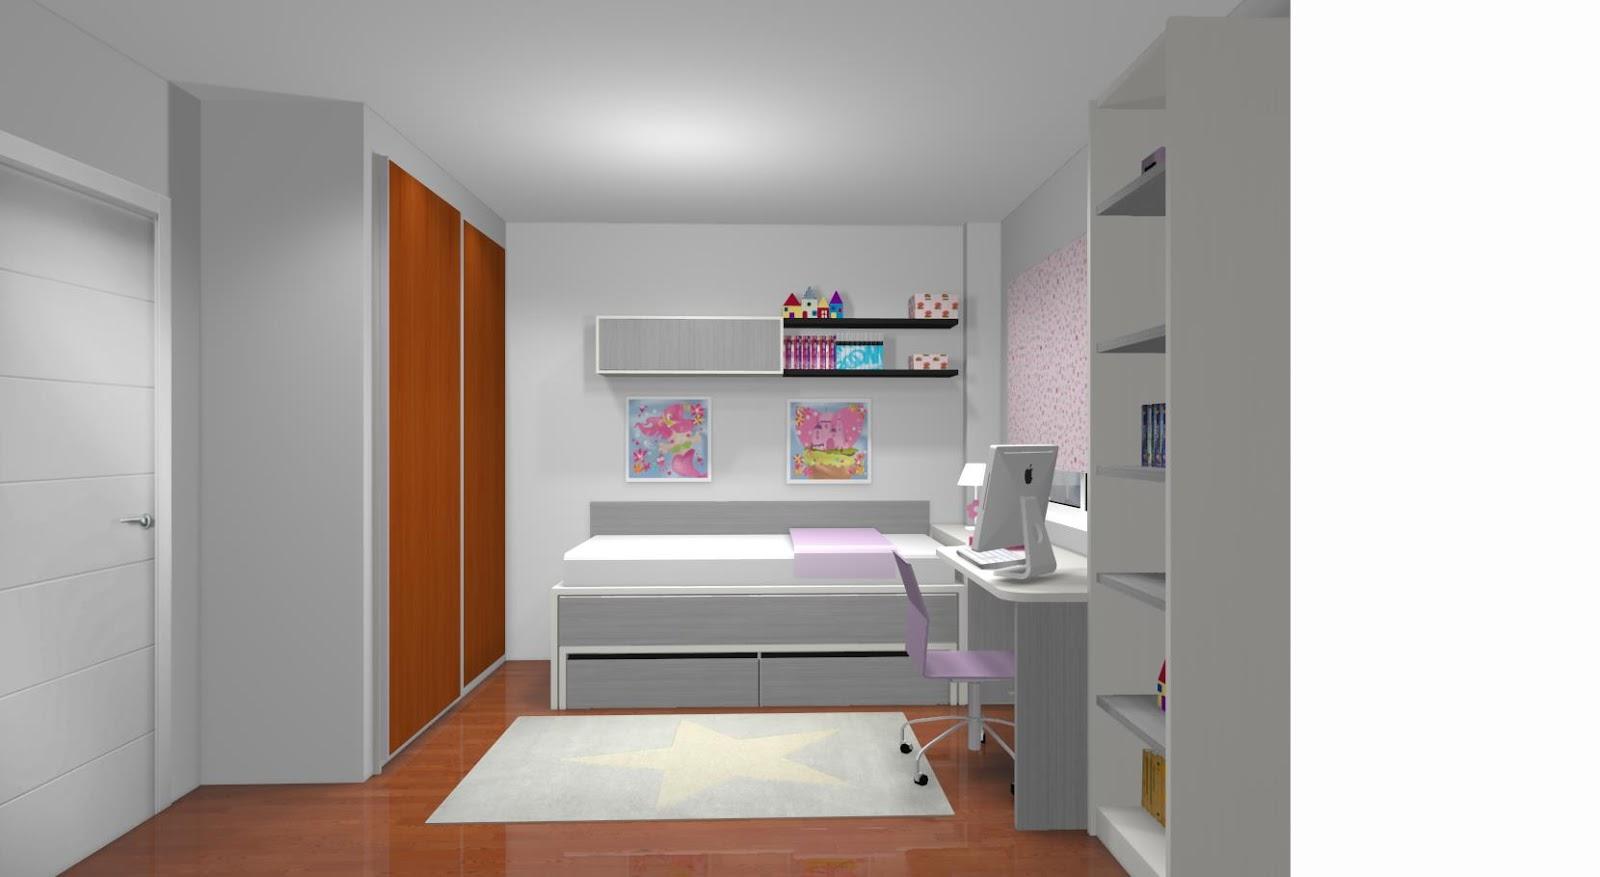 Dormitorios juveniles a medida en madrid for Dormitorios juveniles dos camas